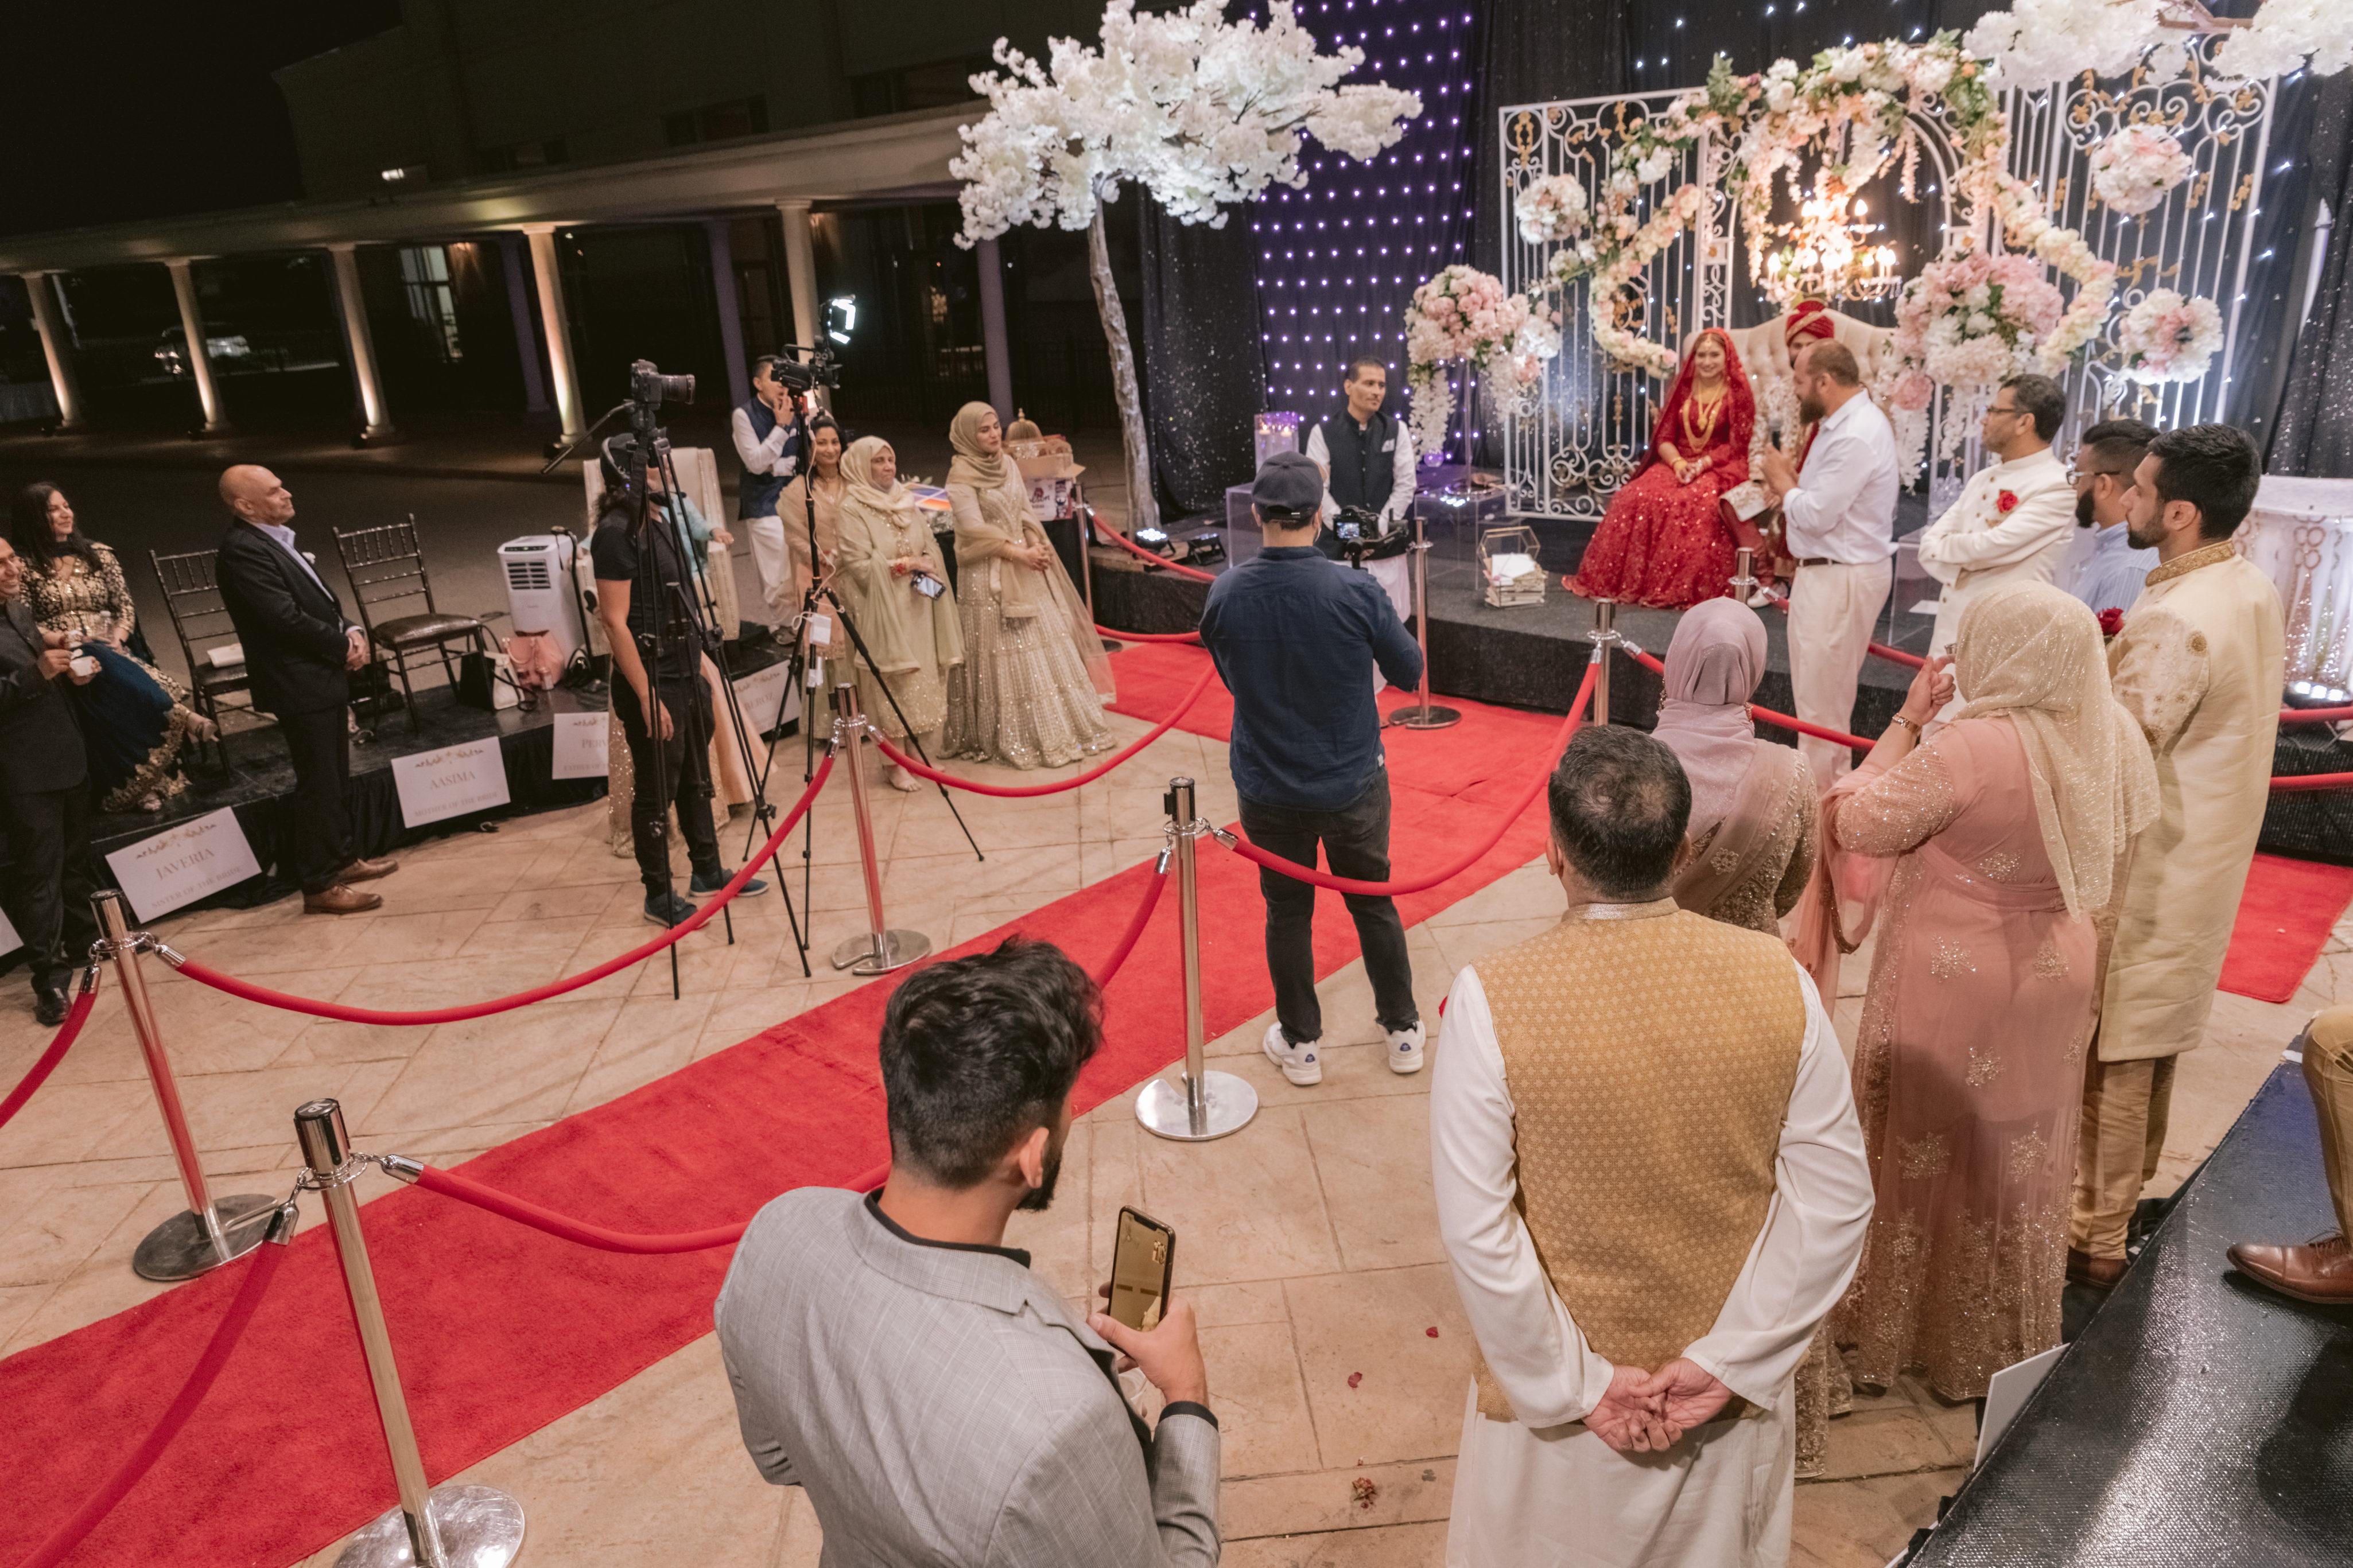 Malaika Pervez and Faraz Hussaini's drive-through wedding at Brampton's Pearson Convention Centre